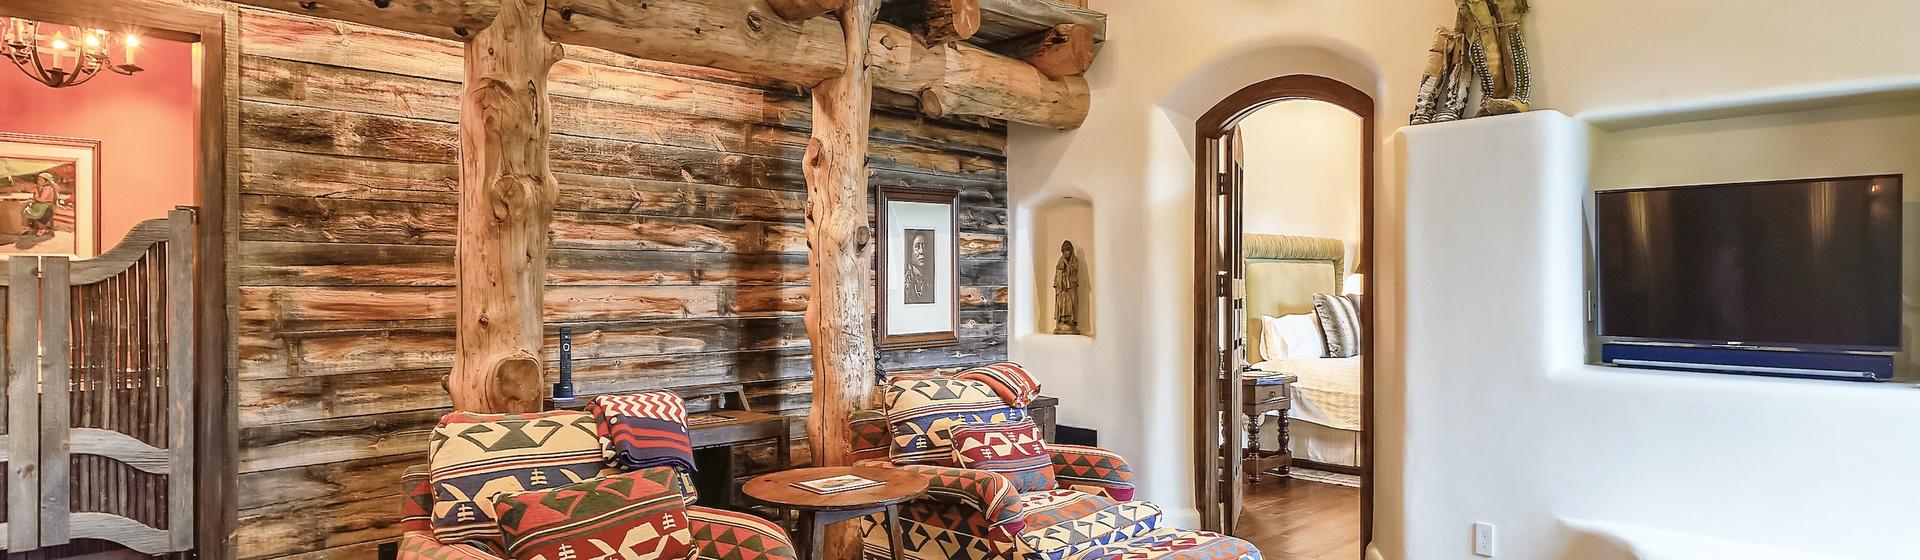 8.3-Telluride-Sleeping-Indian-Ranch-Southwest-Suite-Sitting-Area-2-web.JPG